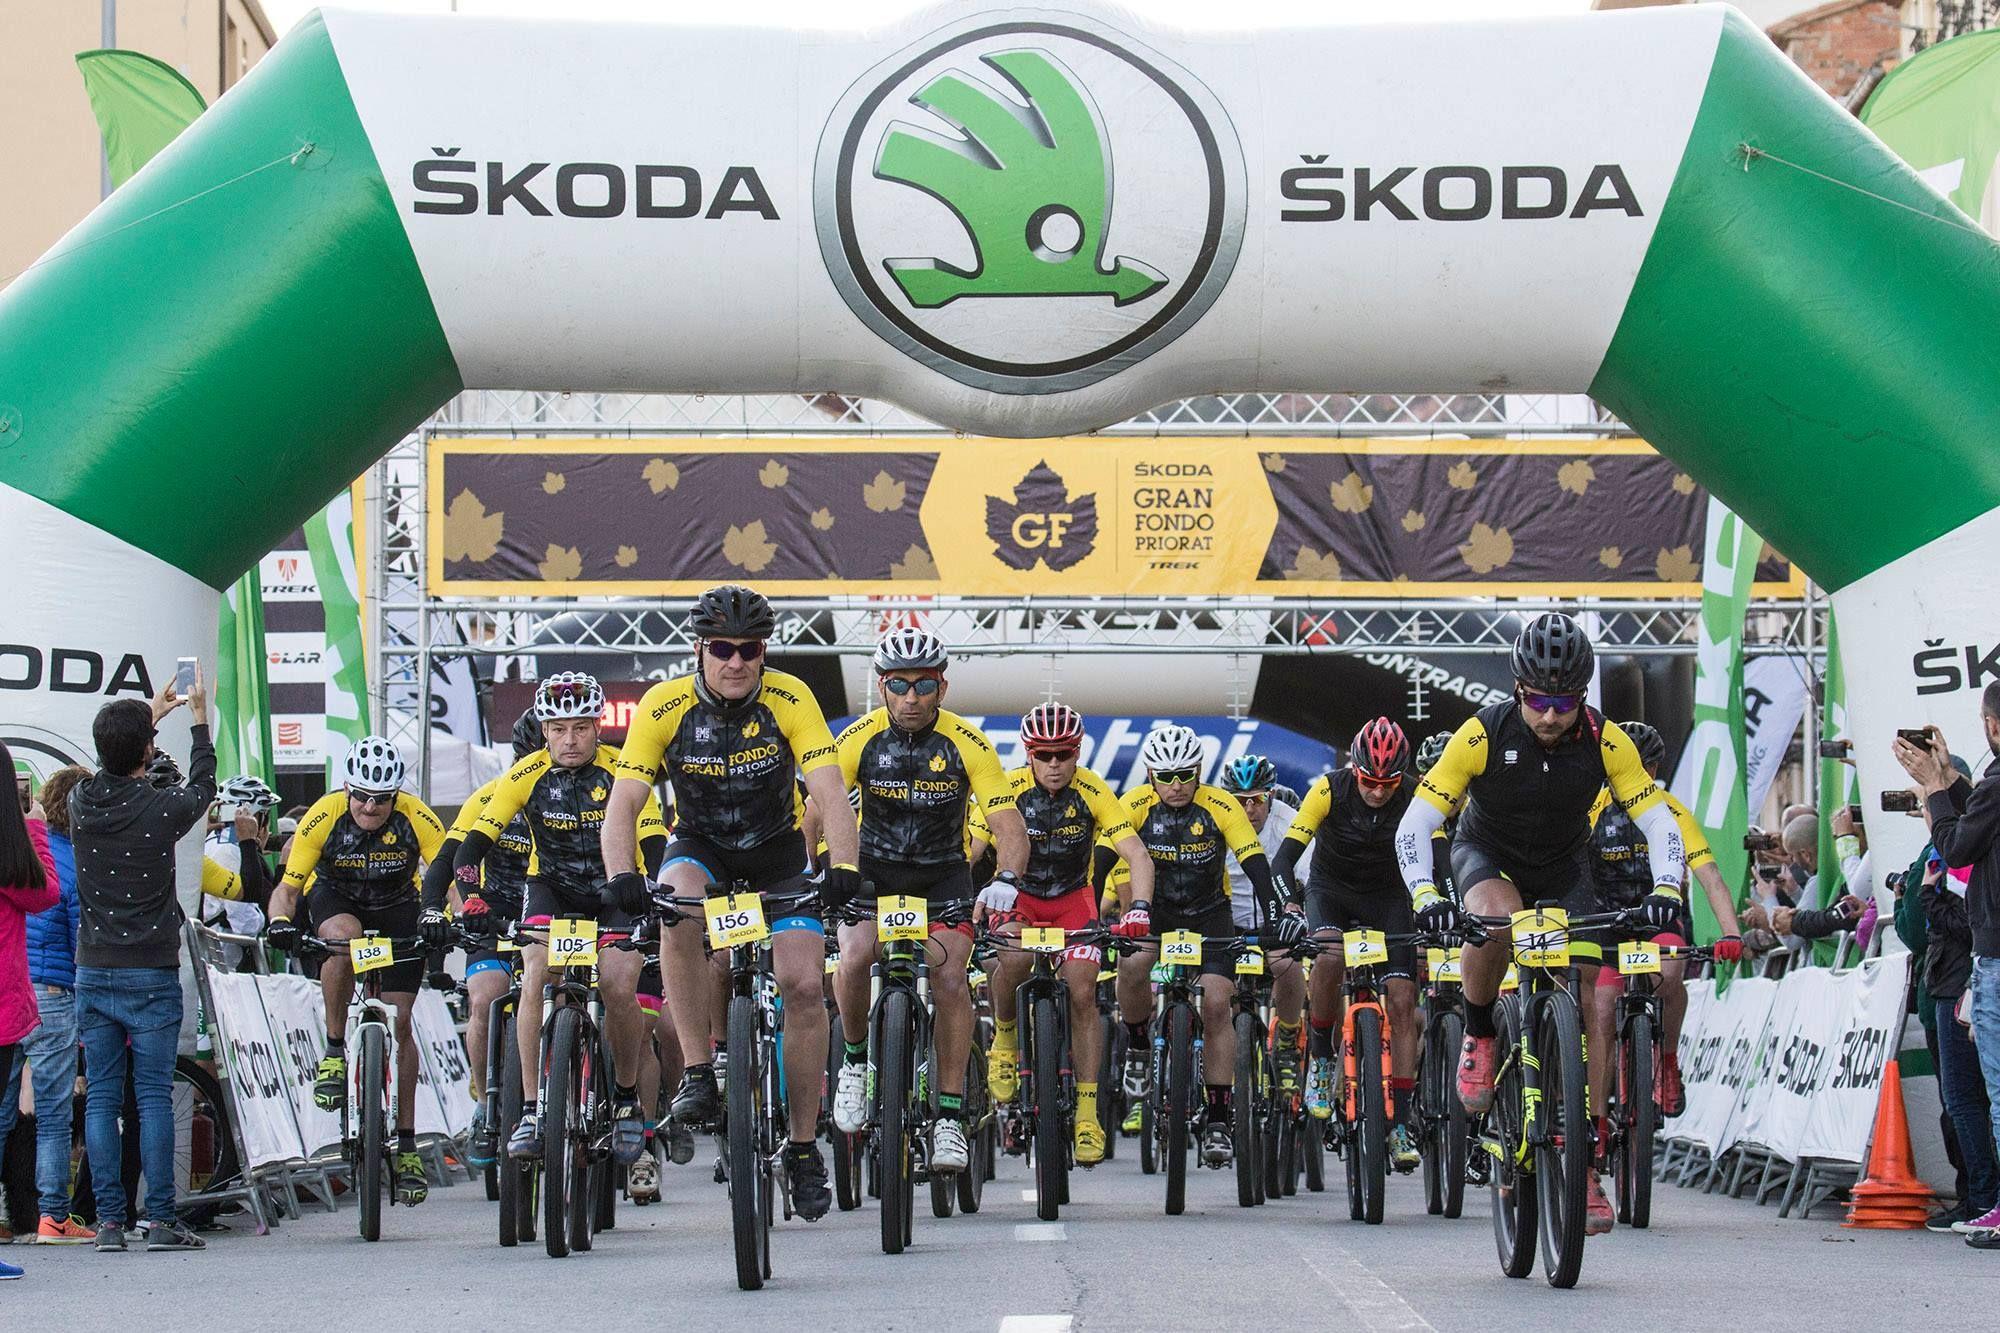 Škoda Gran Fondo Priorat Trek 2017